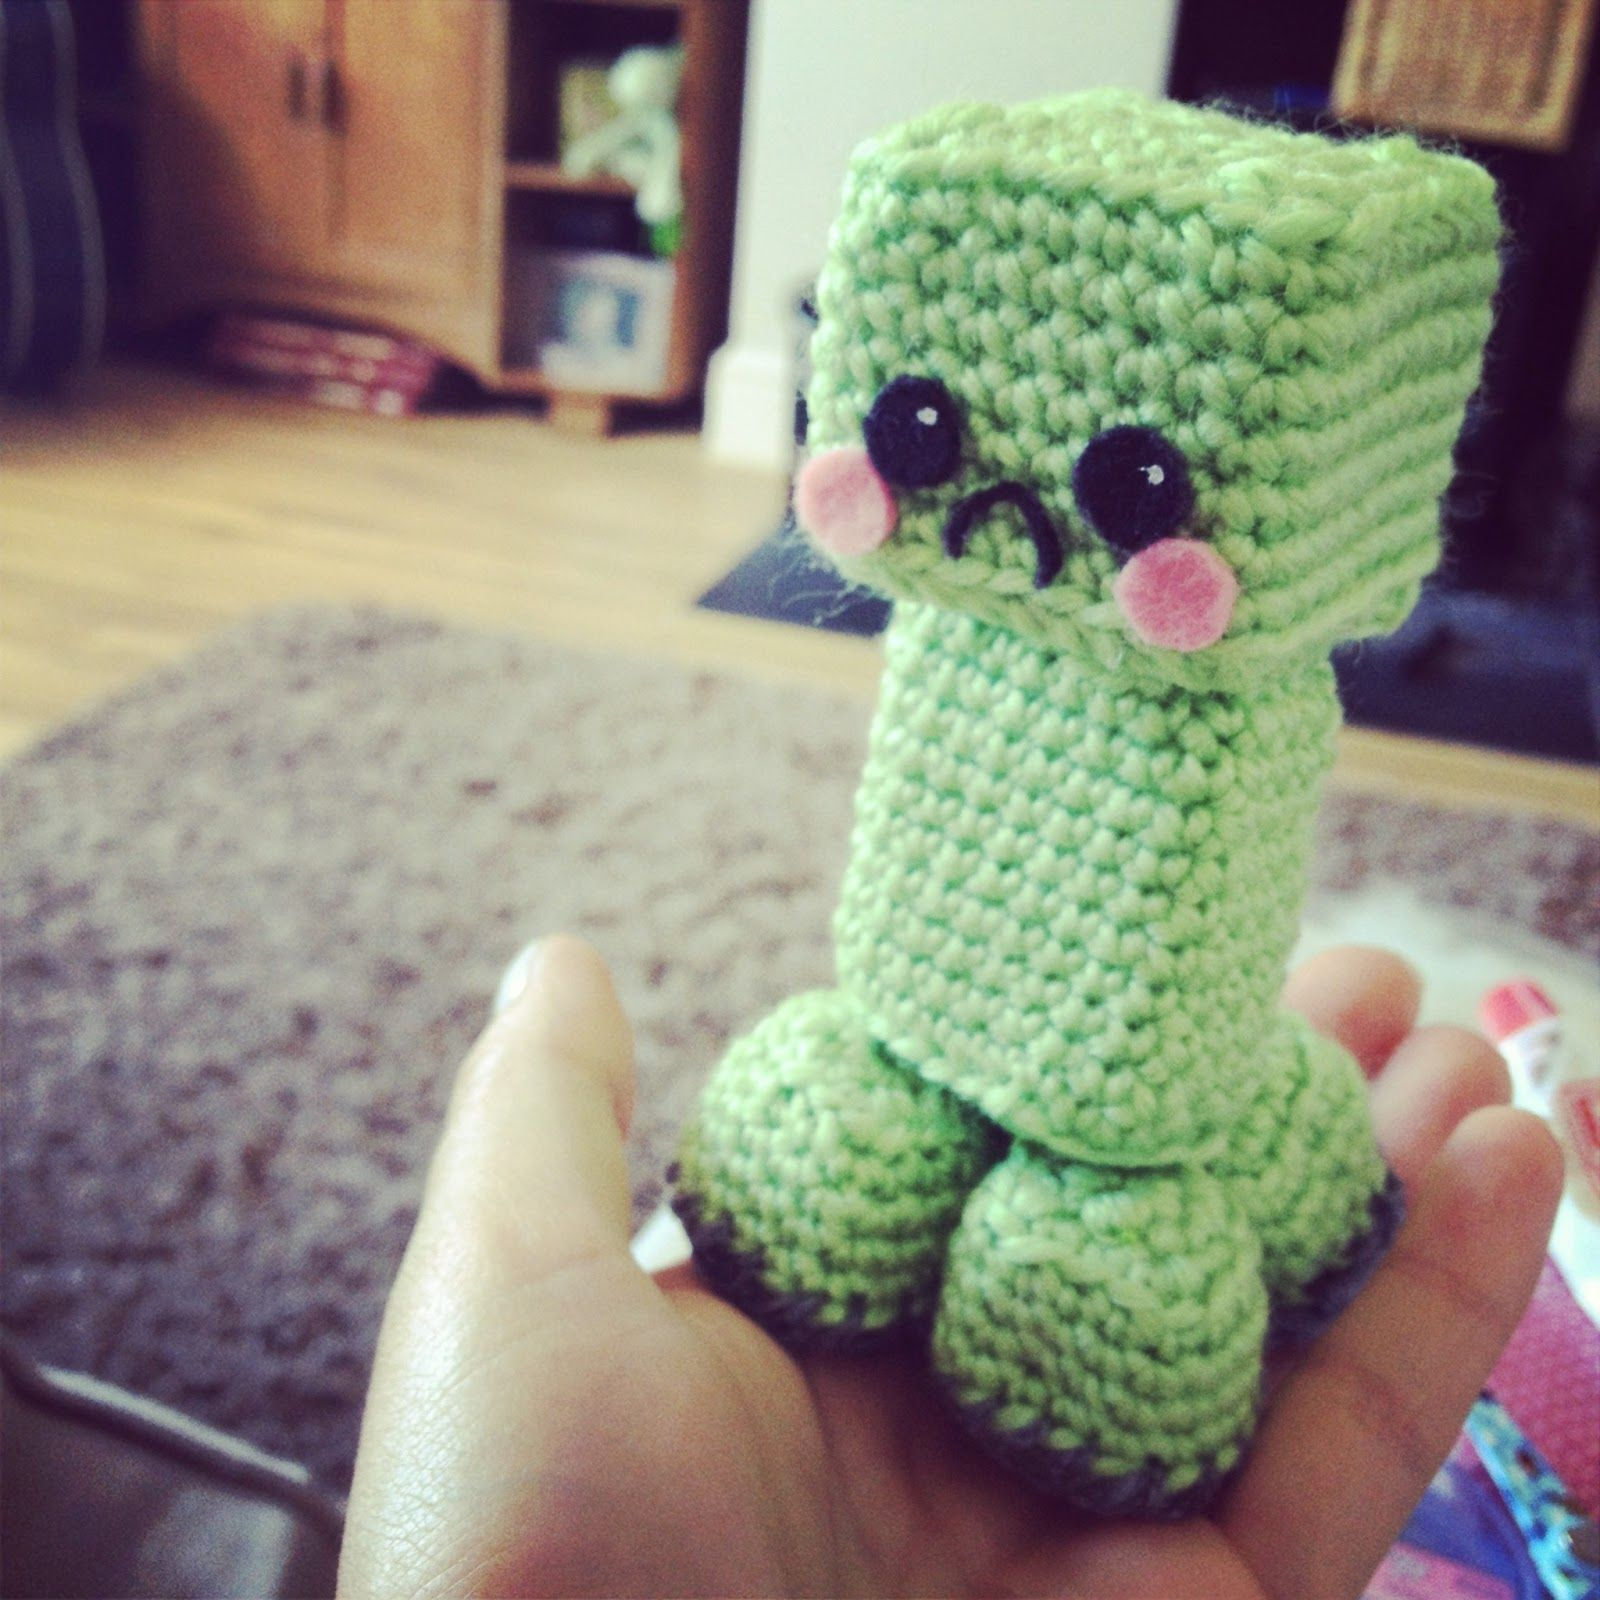 Crochet Creeper Minecraft Crochet Crochet Crochet Amigurumi